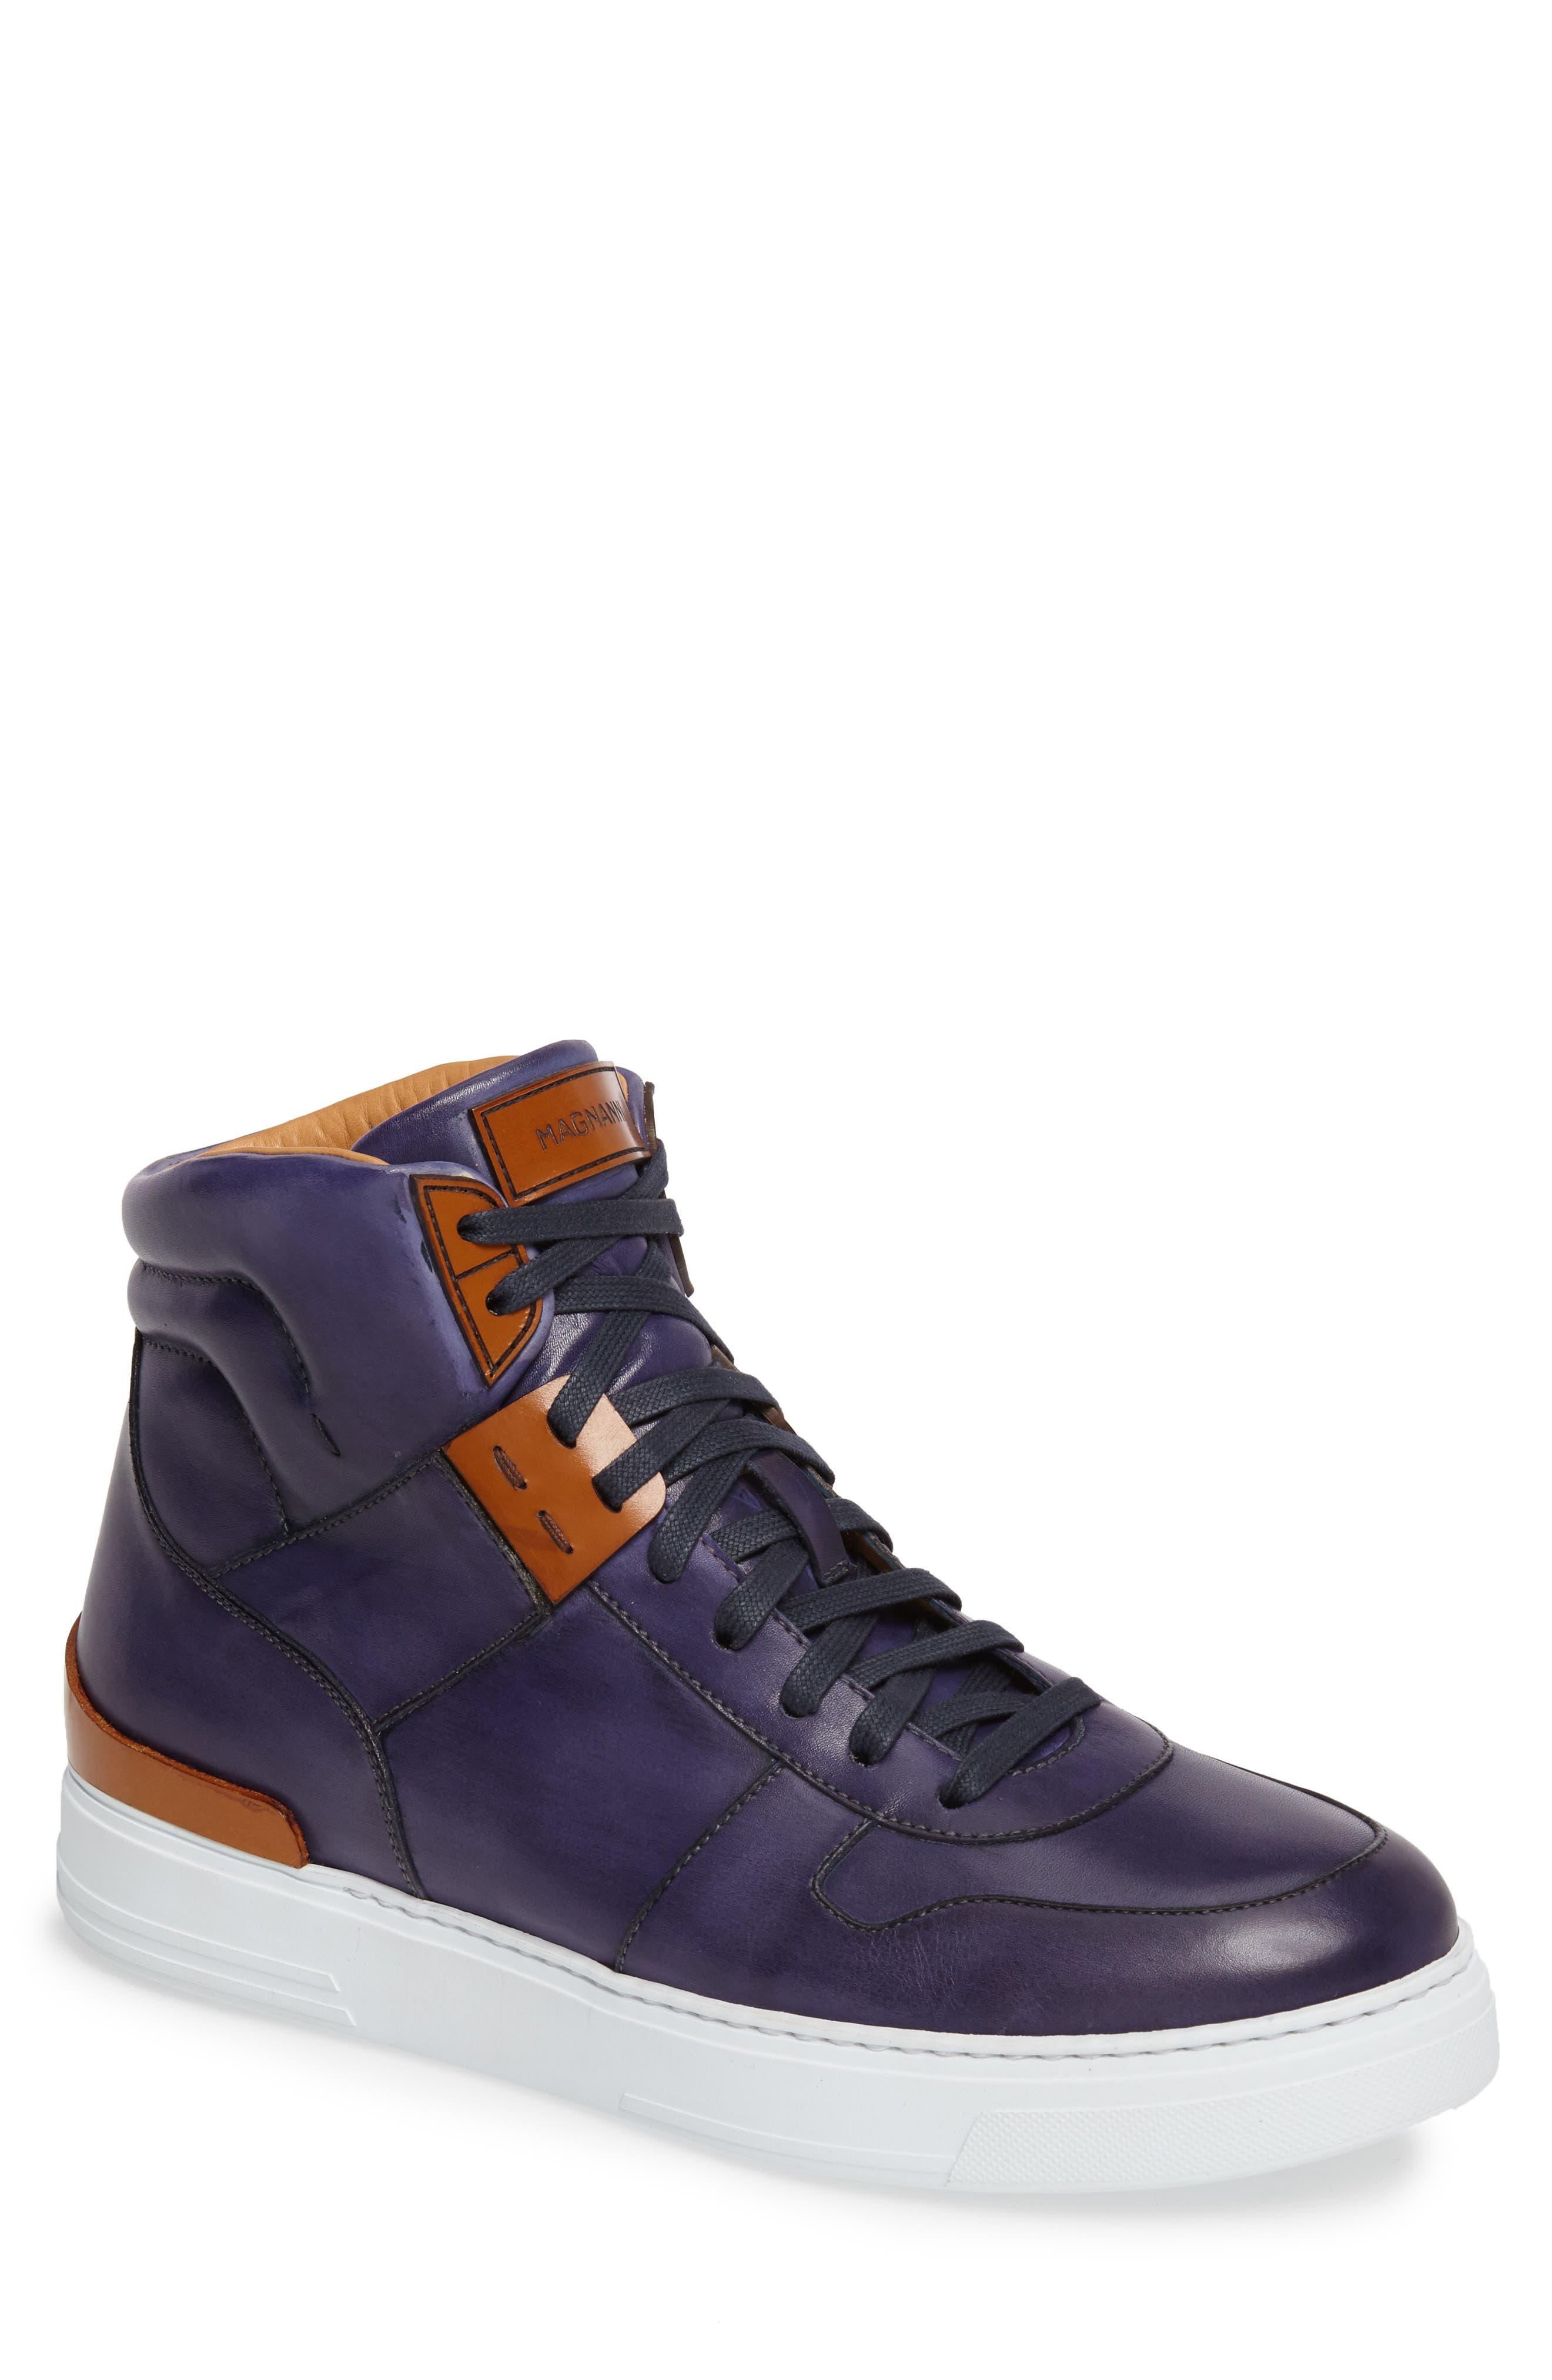 Endo Hi Sneaker,                         Main,                         color, Navy Leather